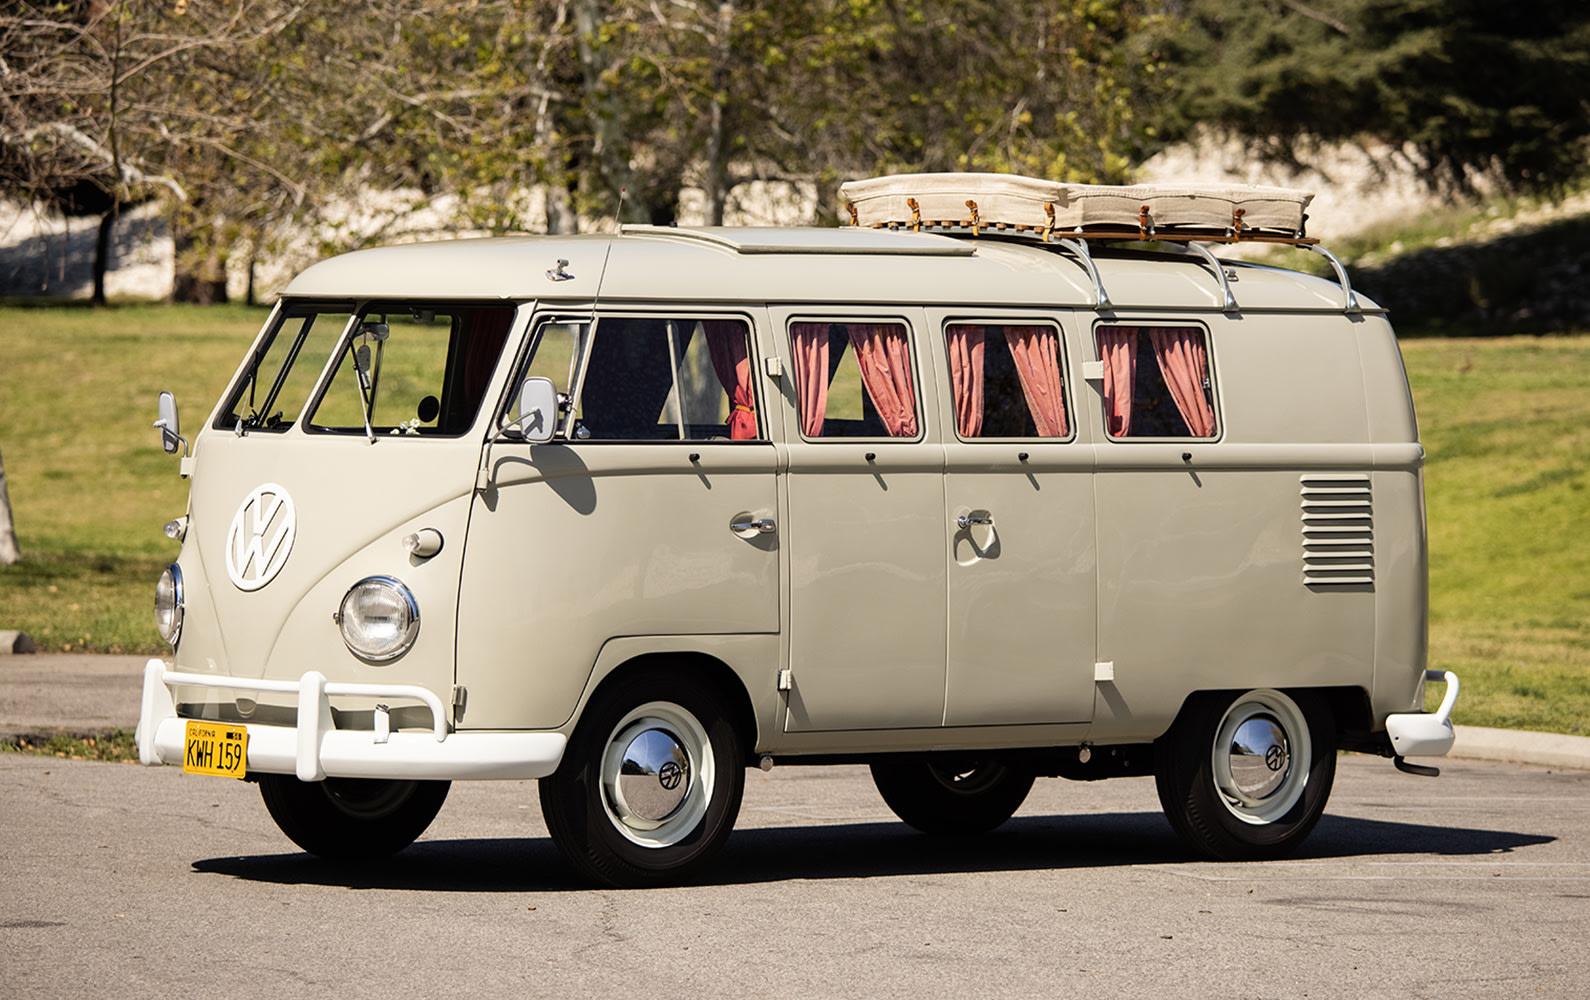 Prod/O21F - May 2021/1464_1960 Volkswagen Type 2 Westfalia Camper/1960_Volkswagen_Type_2_Westfalia_Camper_15_ghackp